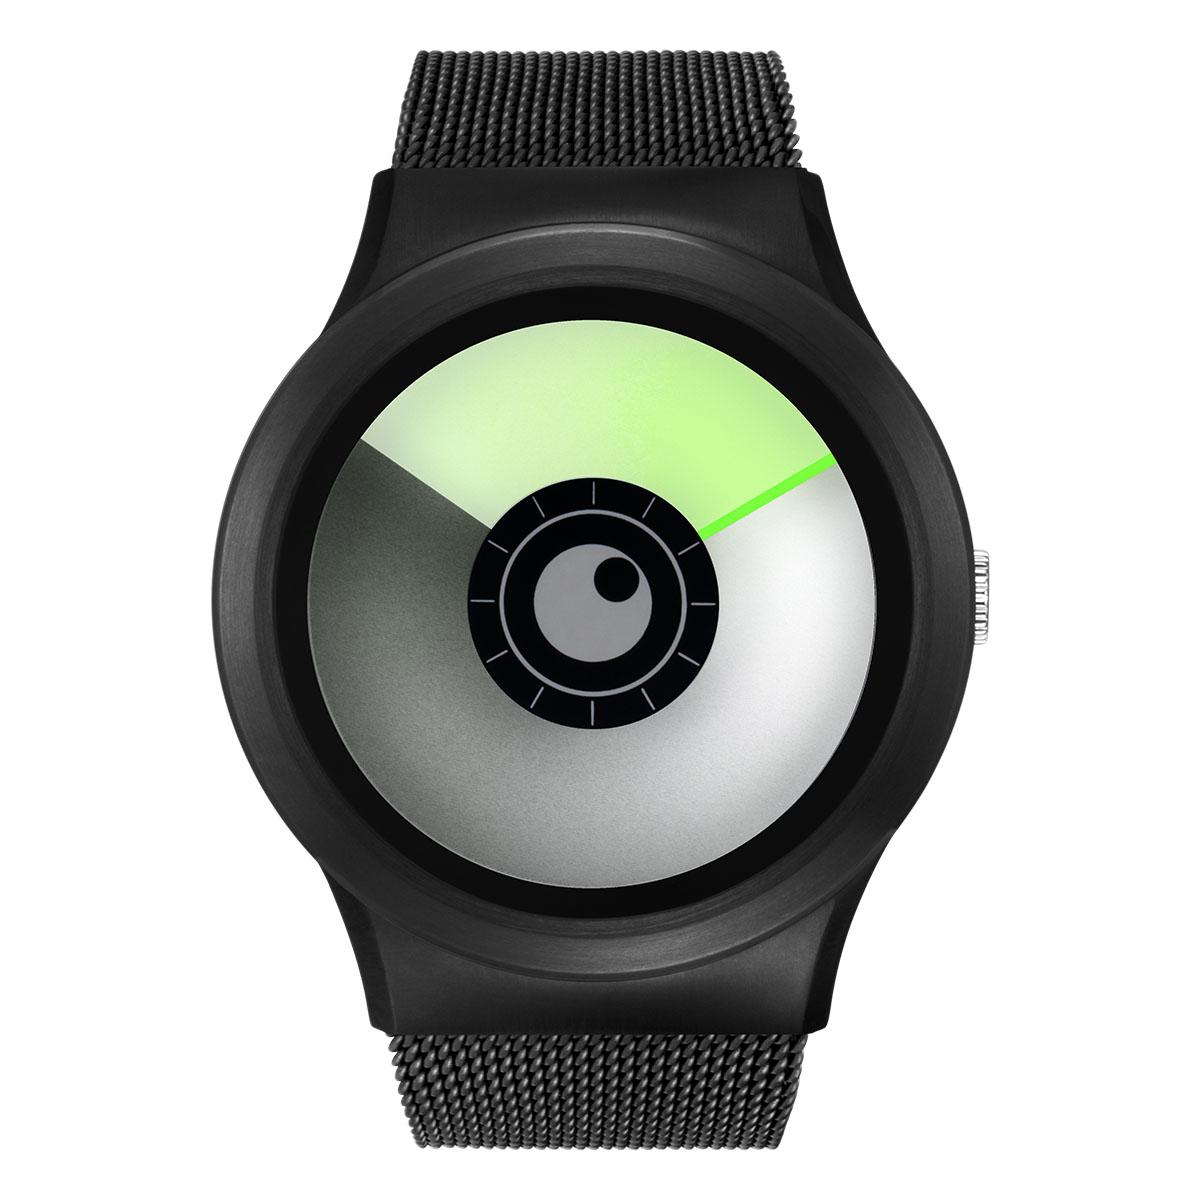 ZEROO AURORA BOREALIS ゼロ 電池式クォーツ 腕時計 [W12022B03SM03] グリーン デザインウォッチ ペア用 メンズ レディース ユニセックス おしゃれ時計 デザイナーズ